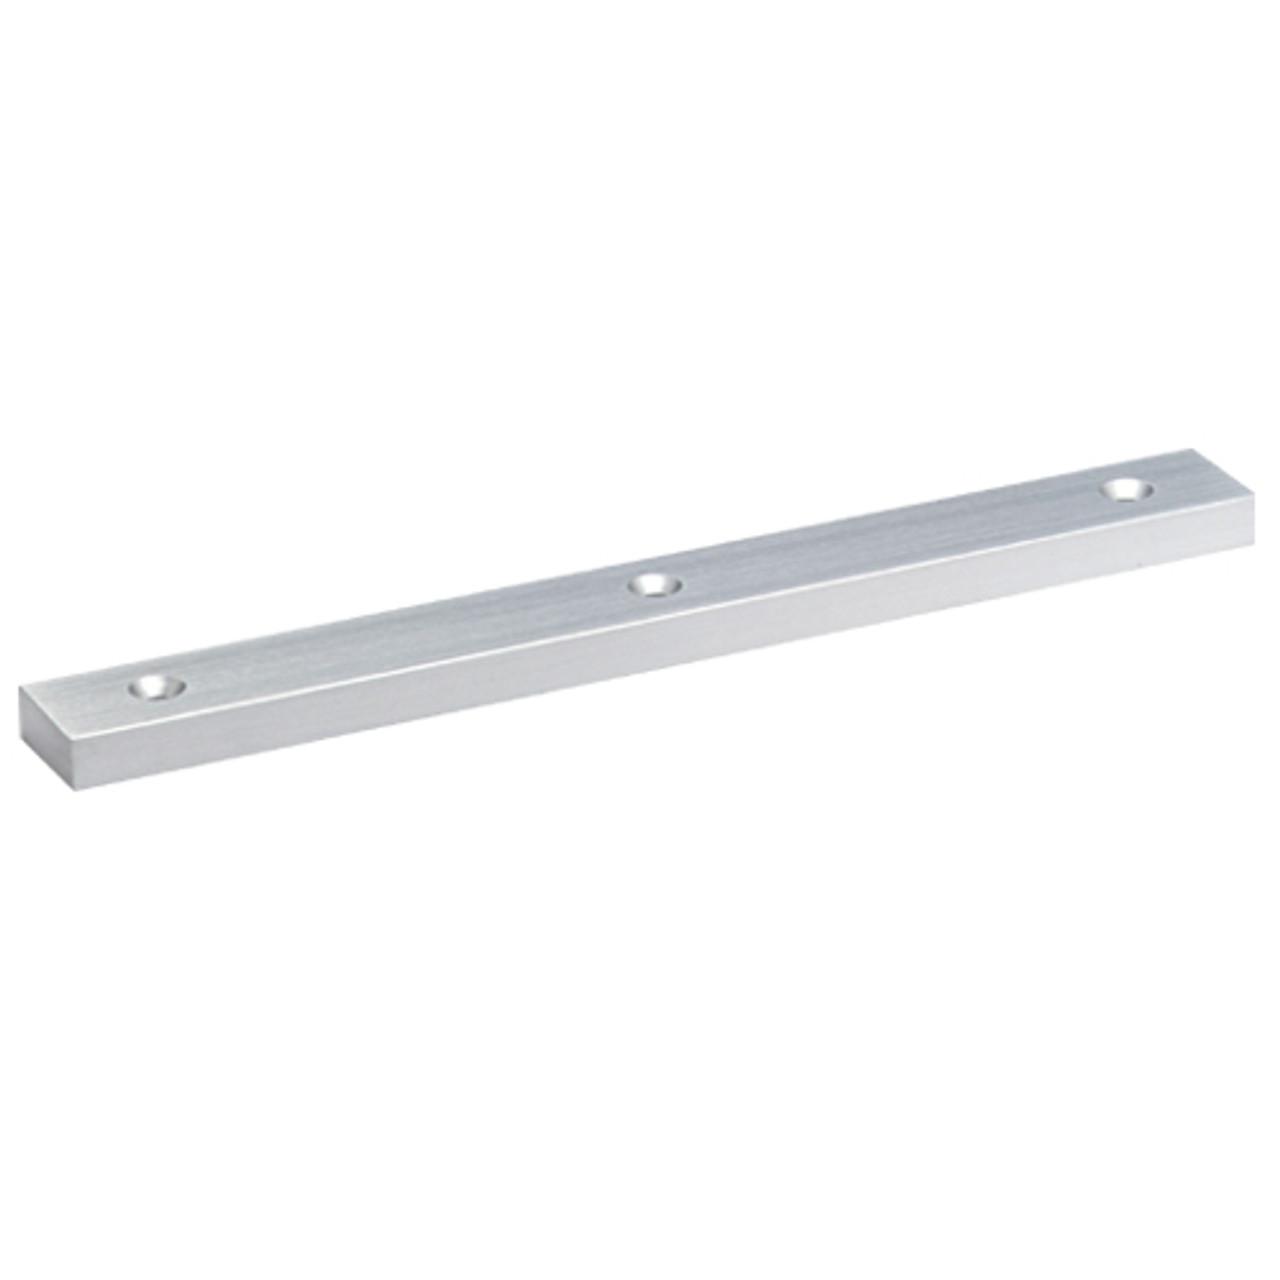 4414-US26 DynaLock 4000 Series Filler Plates for Single Maglocks in Bright Chrome